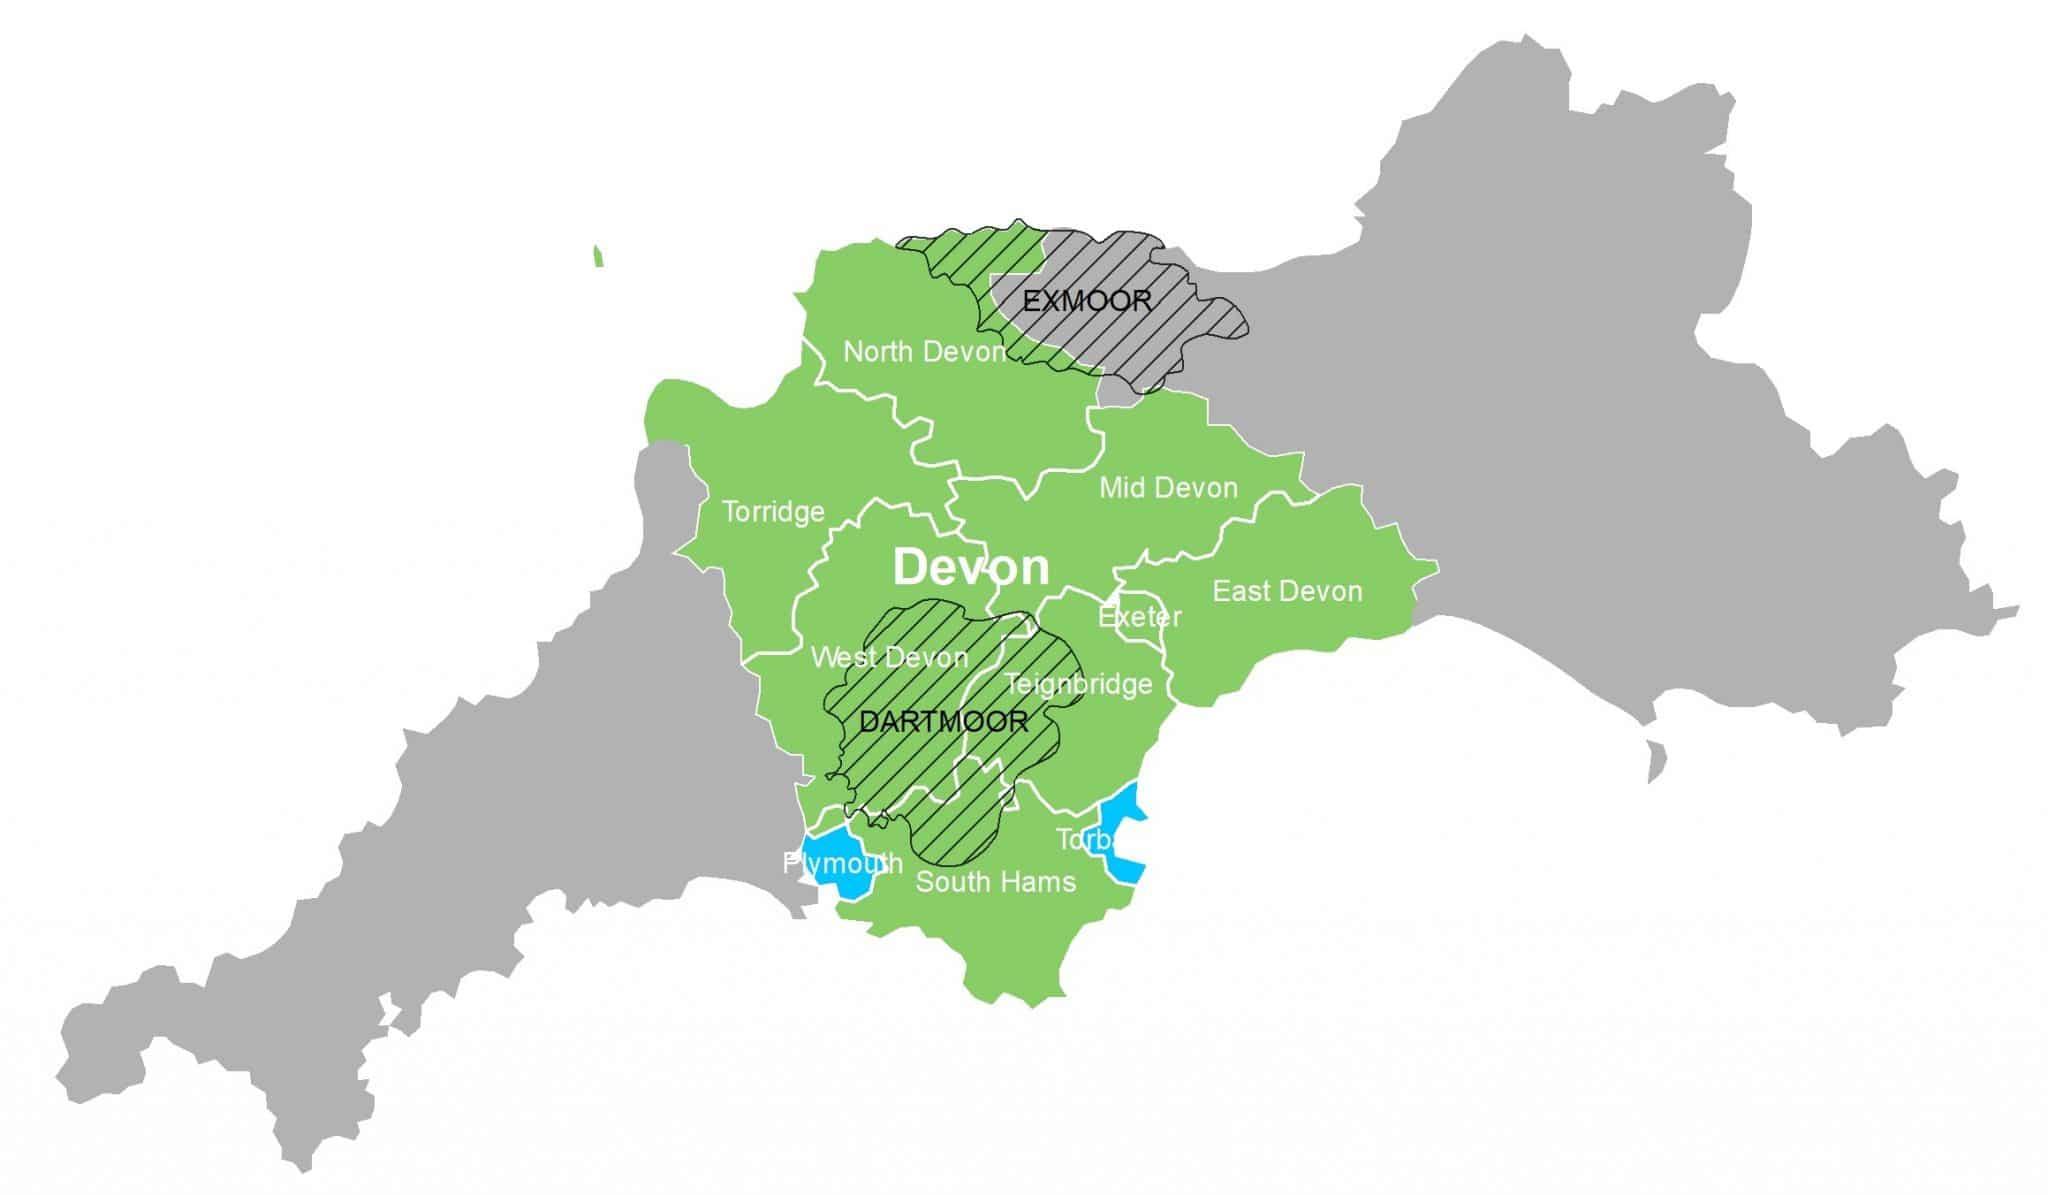 Outline map of devon areas including North, Torridge, Mid Devon, West Devon, East Devon, Exeter, West devon, Teignbridge, South Hams, Dartmoor and Exmoor